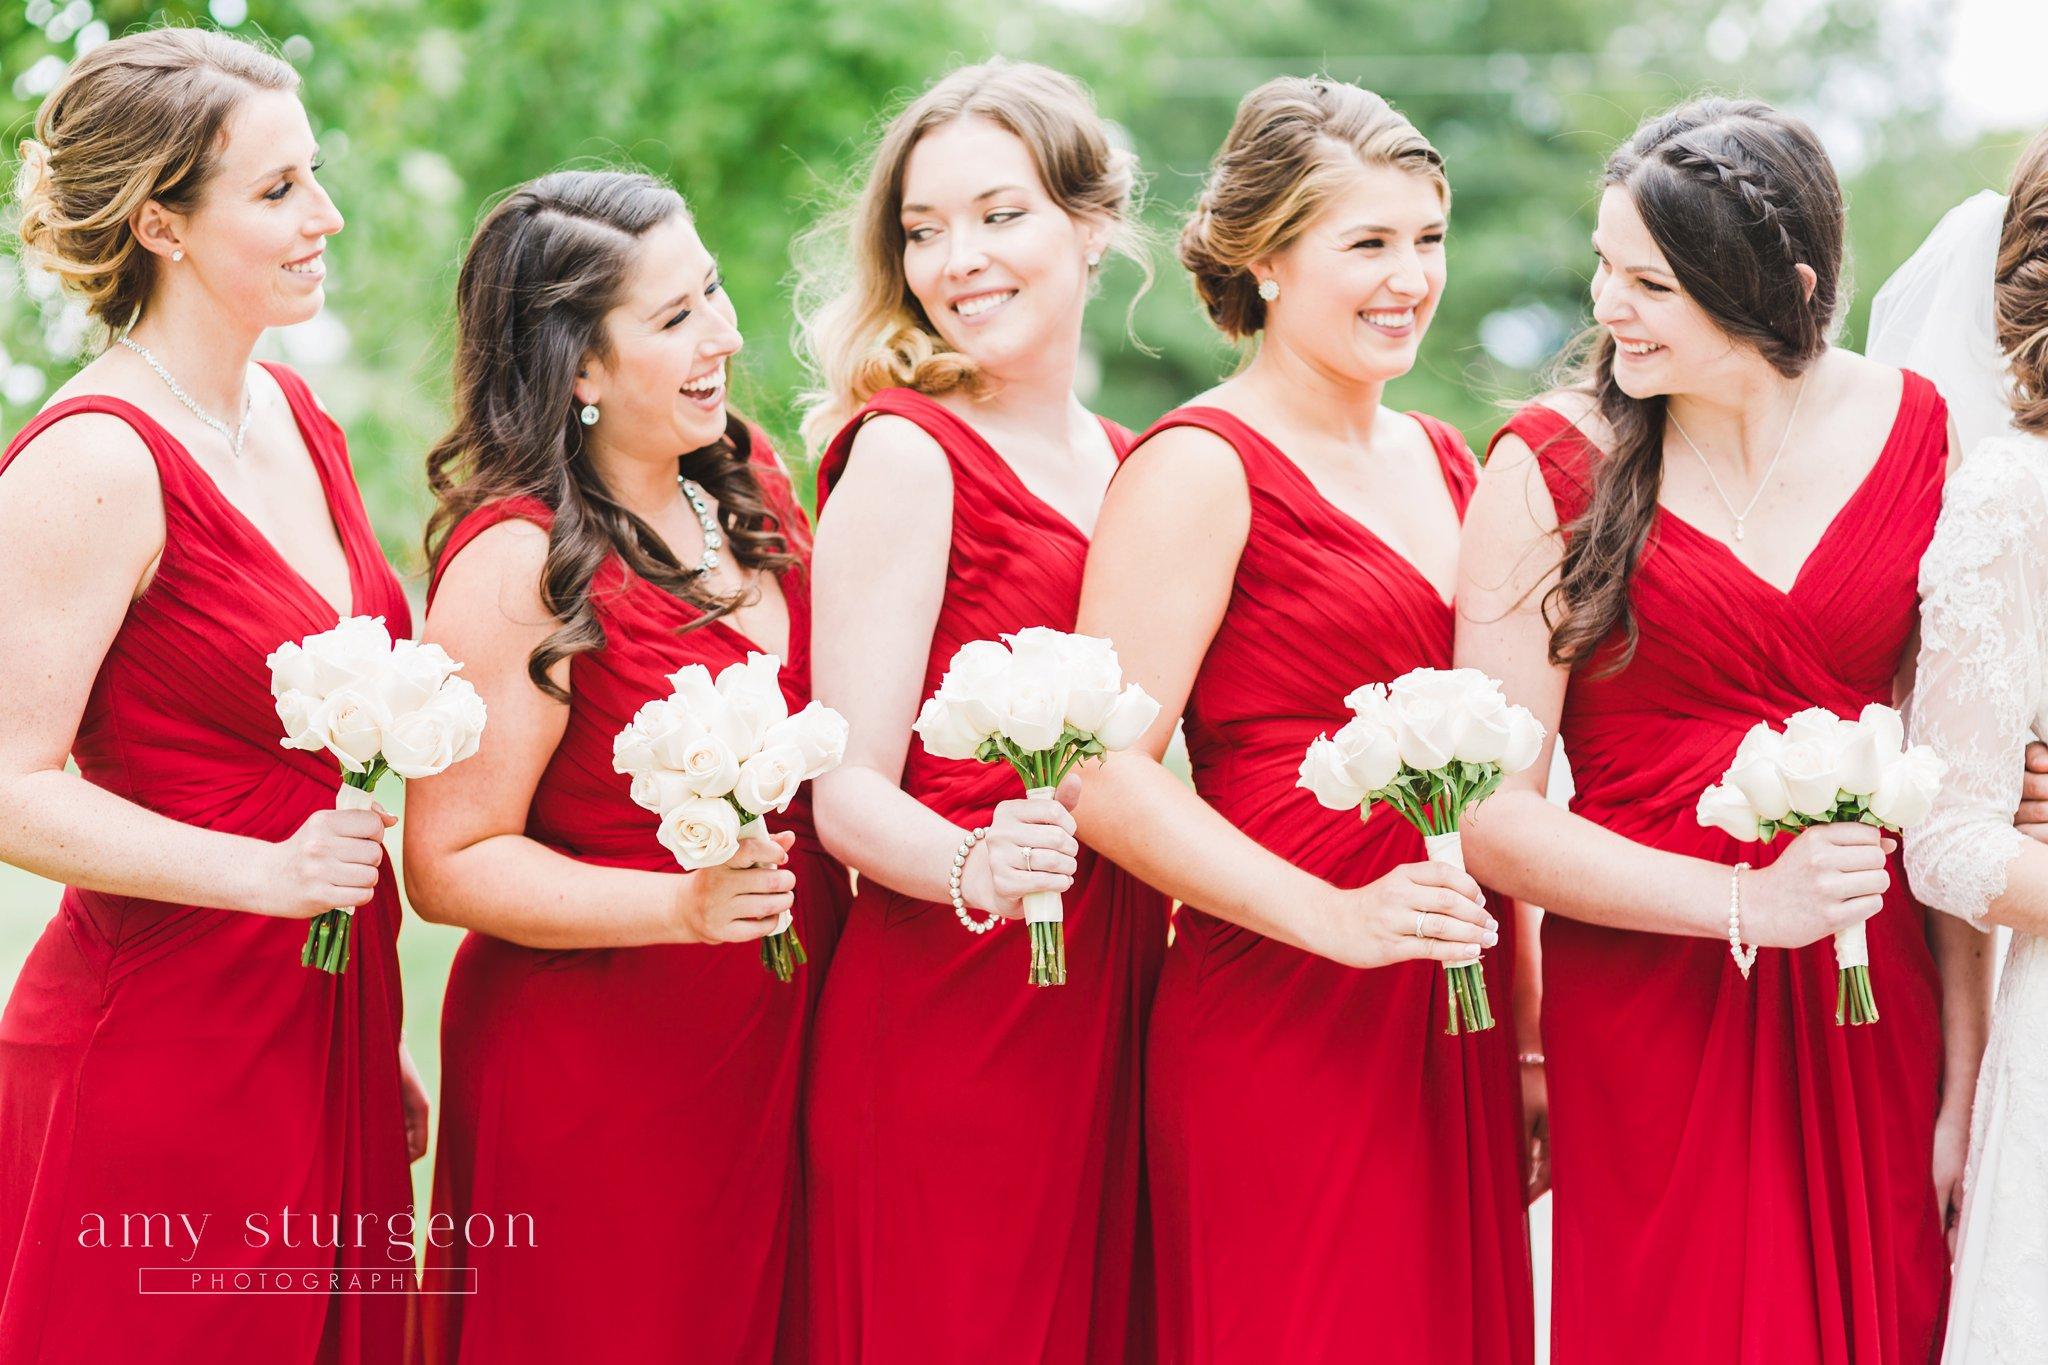 Red david's bridal dresses at the alpaca farm wedding